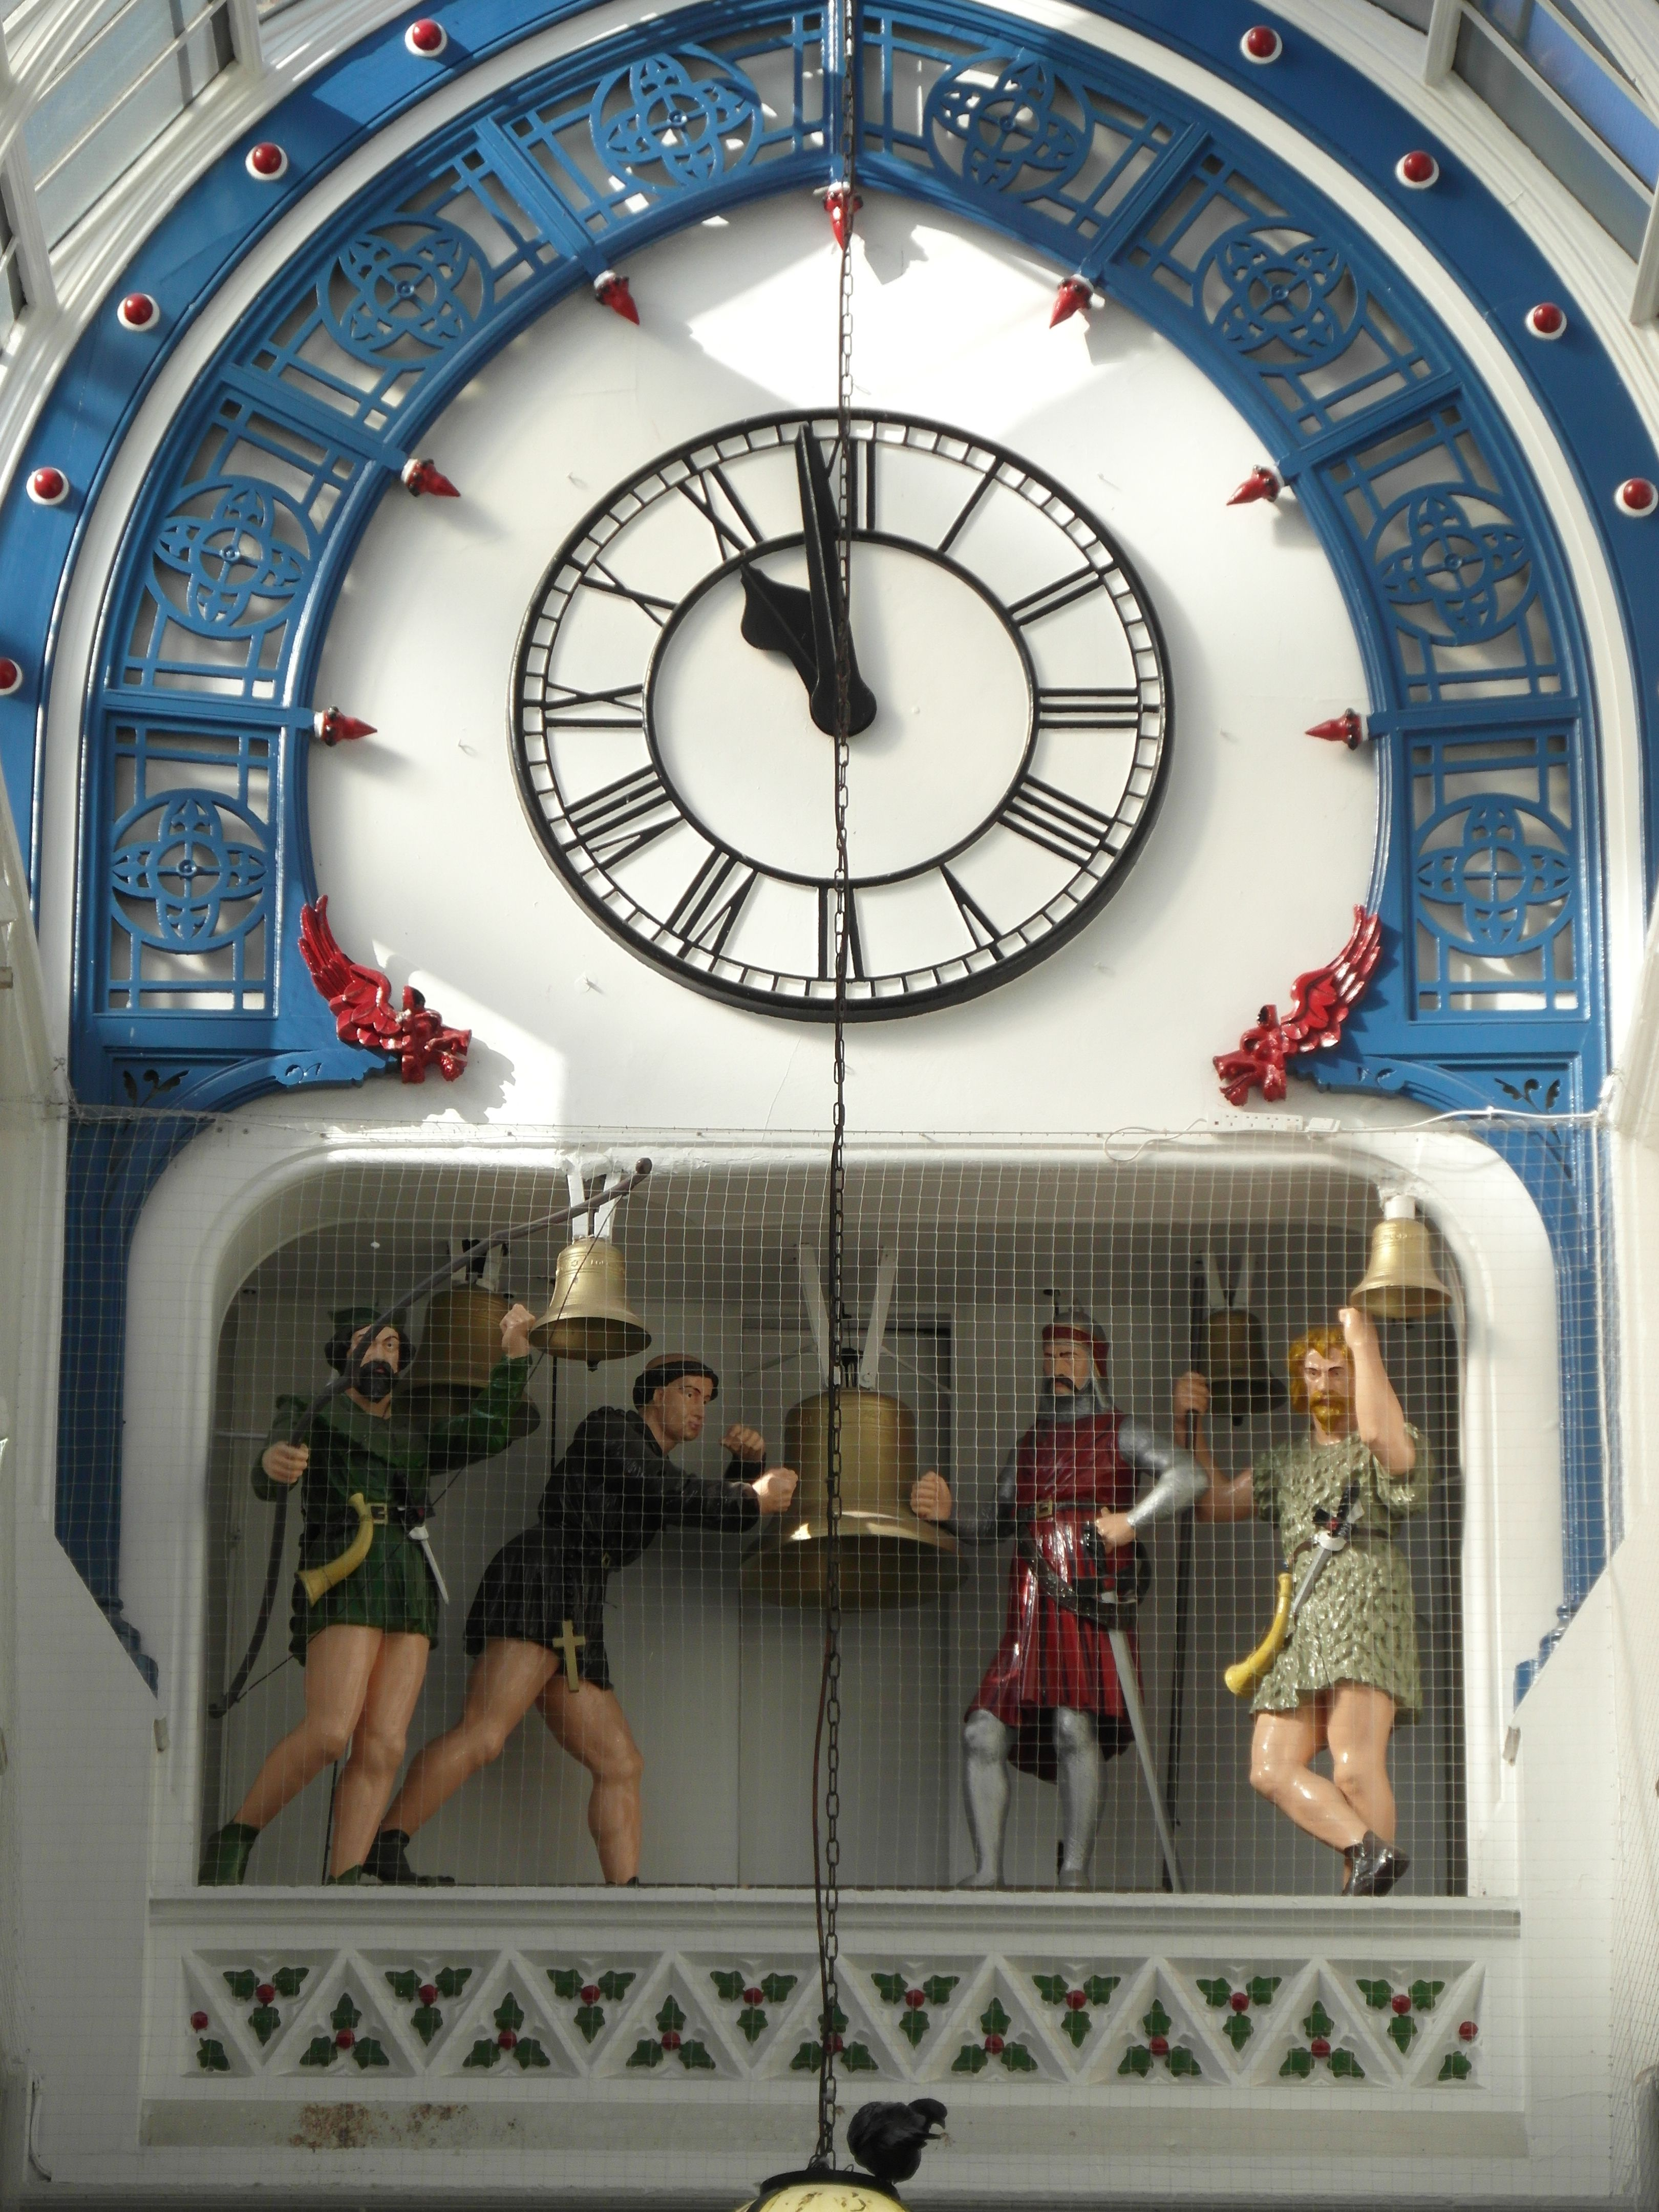 cd6bd7ac523 Robin Hood Mechanical Clock - Victorian Gothic Thornton s Arcade - Leeds -  West Yorkshire - England